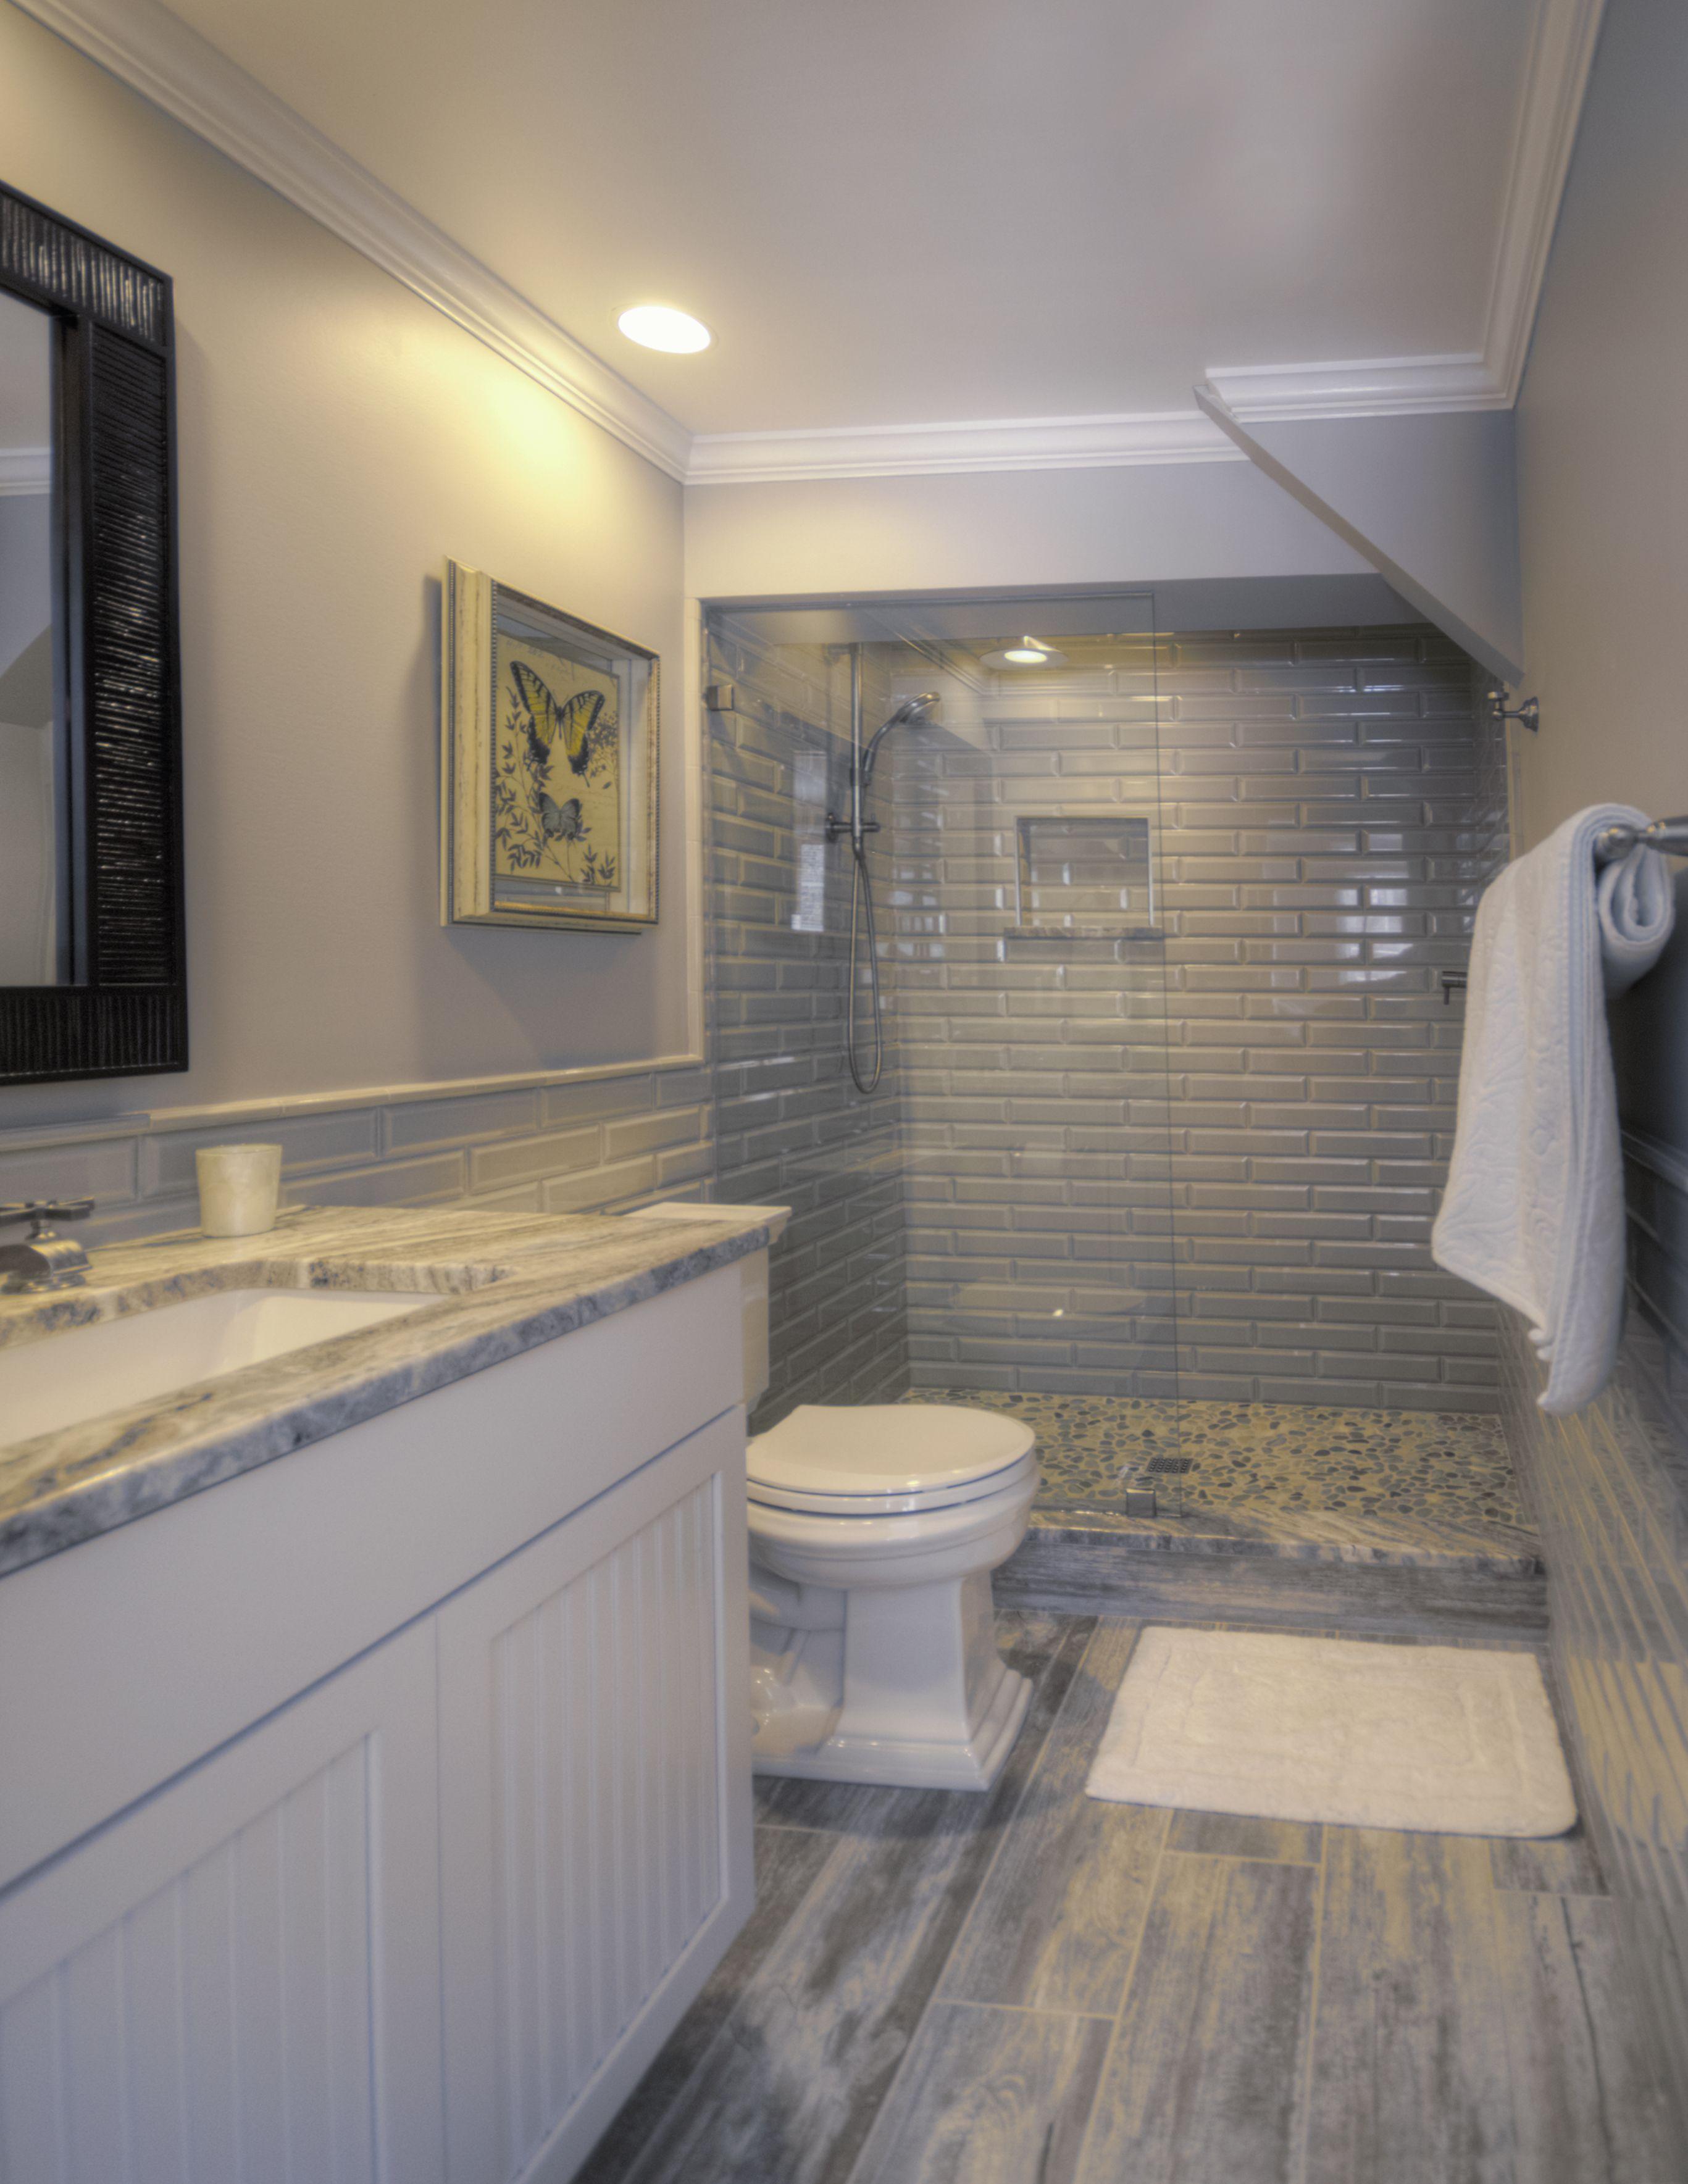 Visit conestoga tile today and create a custom luxury bathroom jds construction beveled subway tile shower walls wood look porcelain floor tile pebble shower floor dailygadgetfo Images